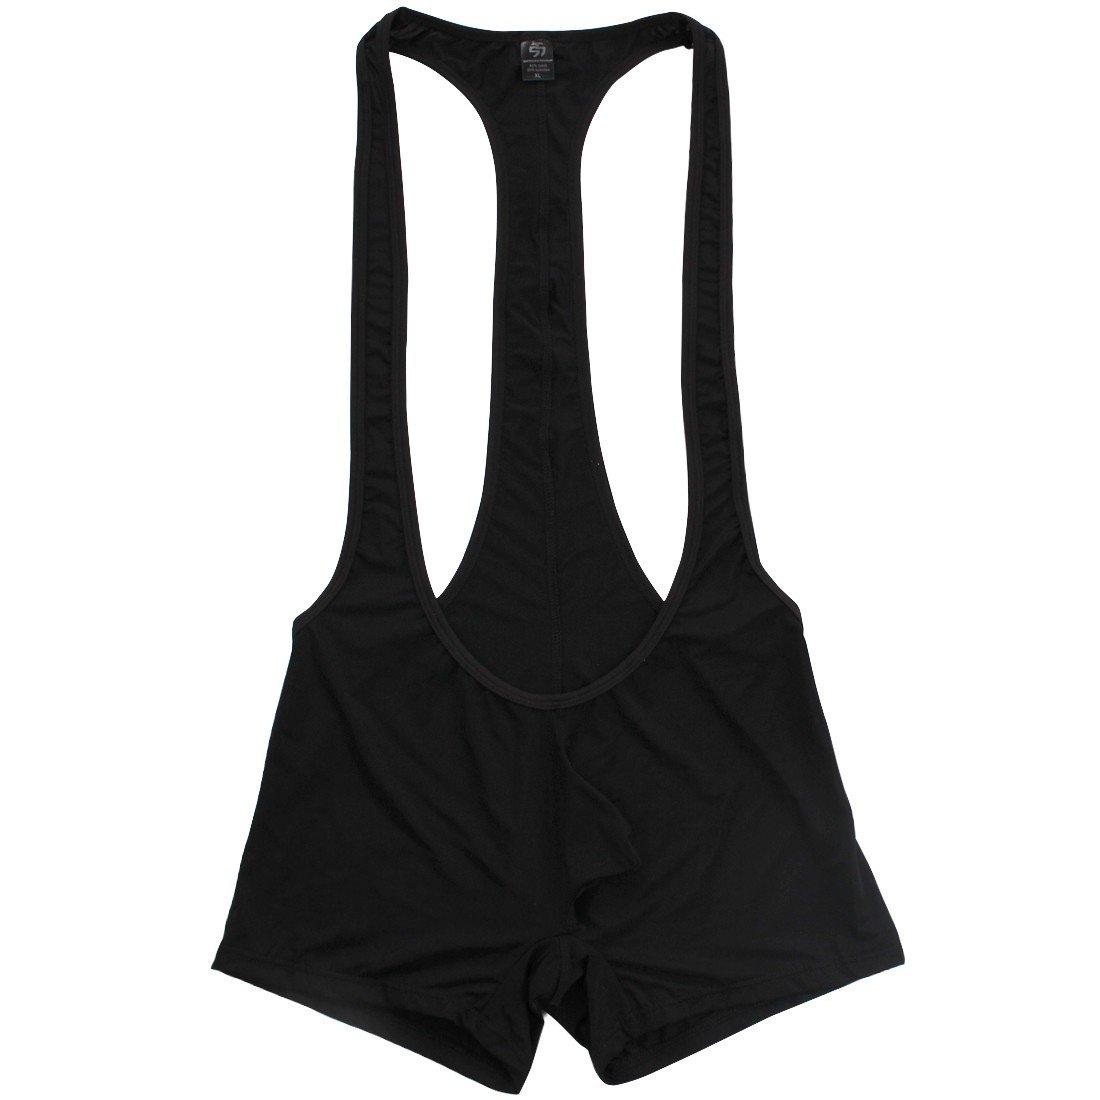 FEESHOW Men's Stretch Bodysuit Jockstrap Briefs Sports Underwear Wrestling Singlet